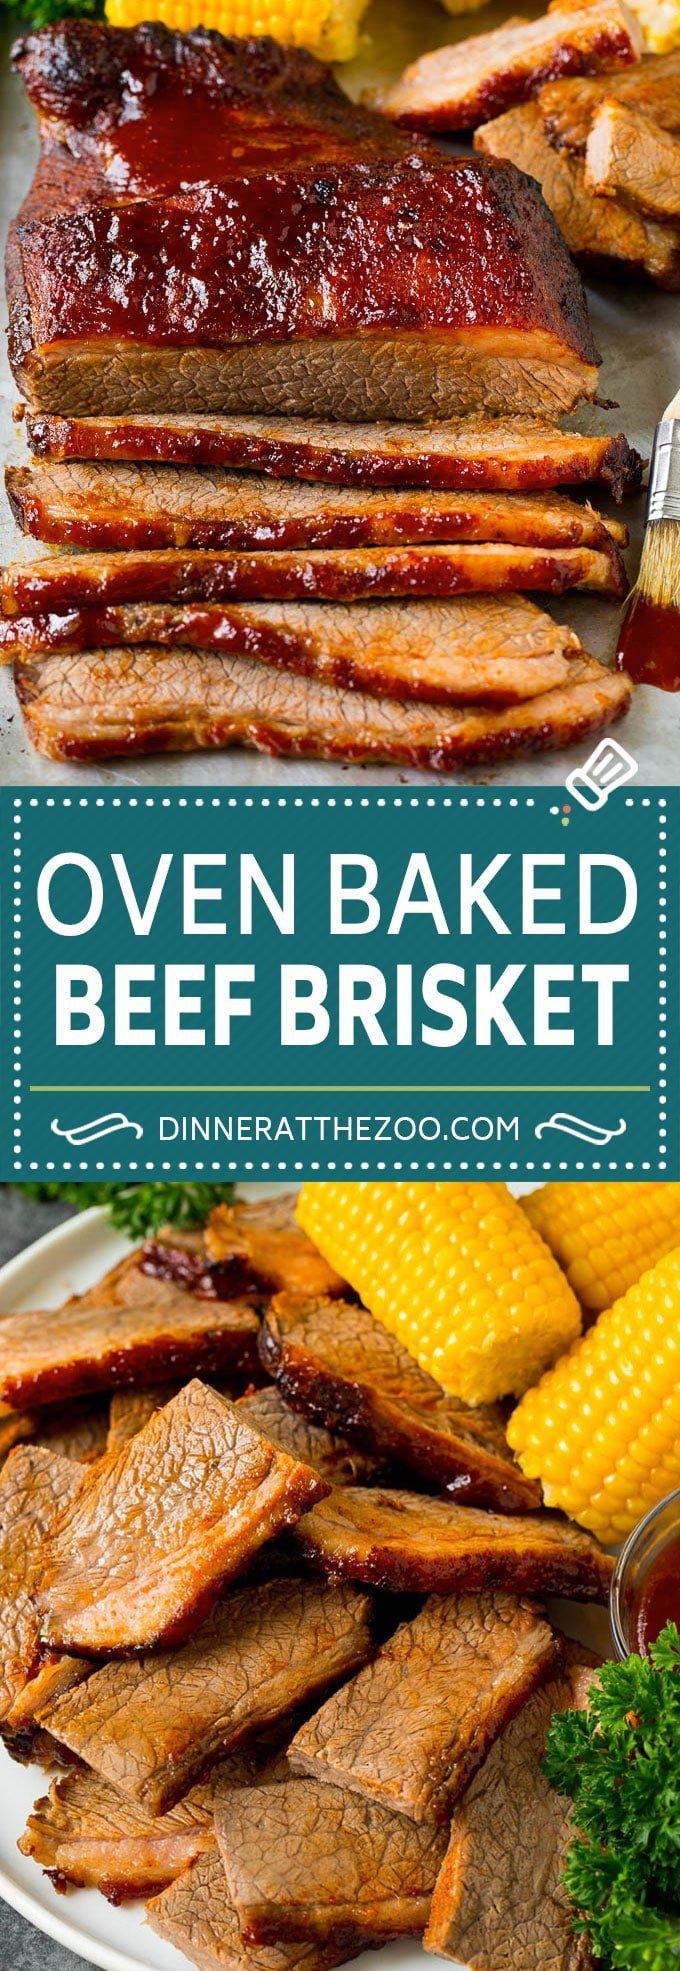 Beef Brisket Recipe #beef #brisket #dinner #dinneratthezoo